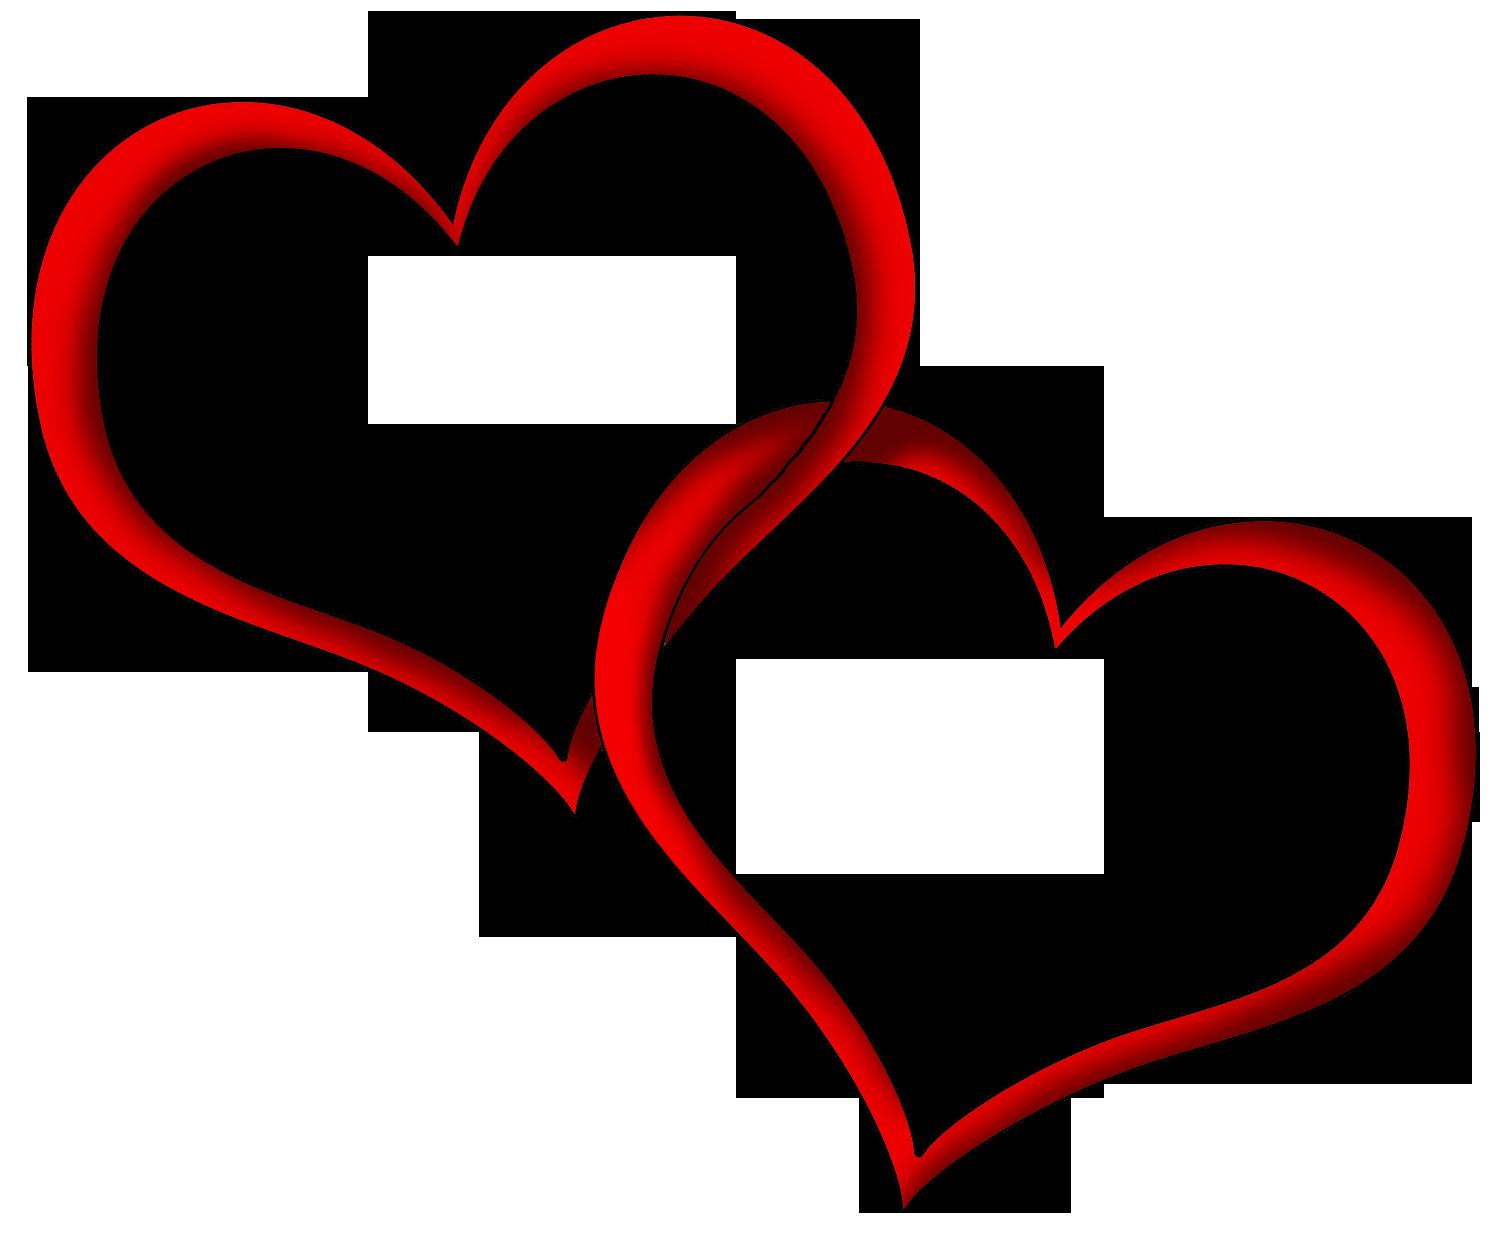 ... Red Heart Clip Art - clipartall